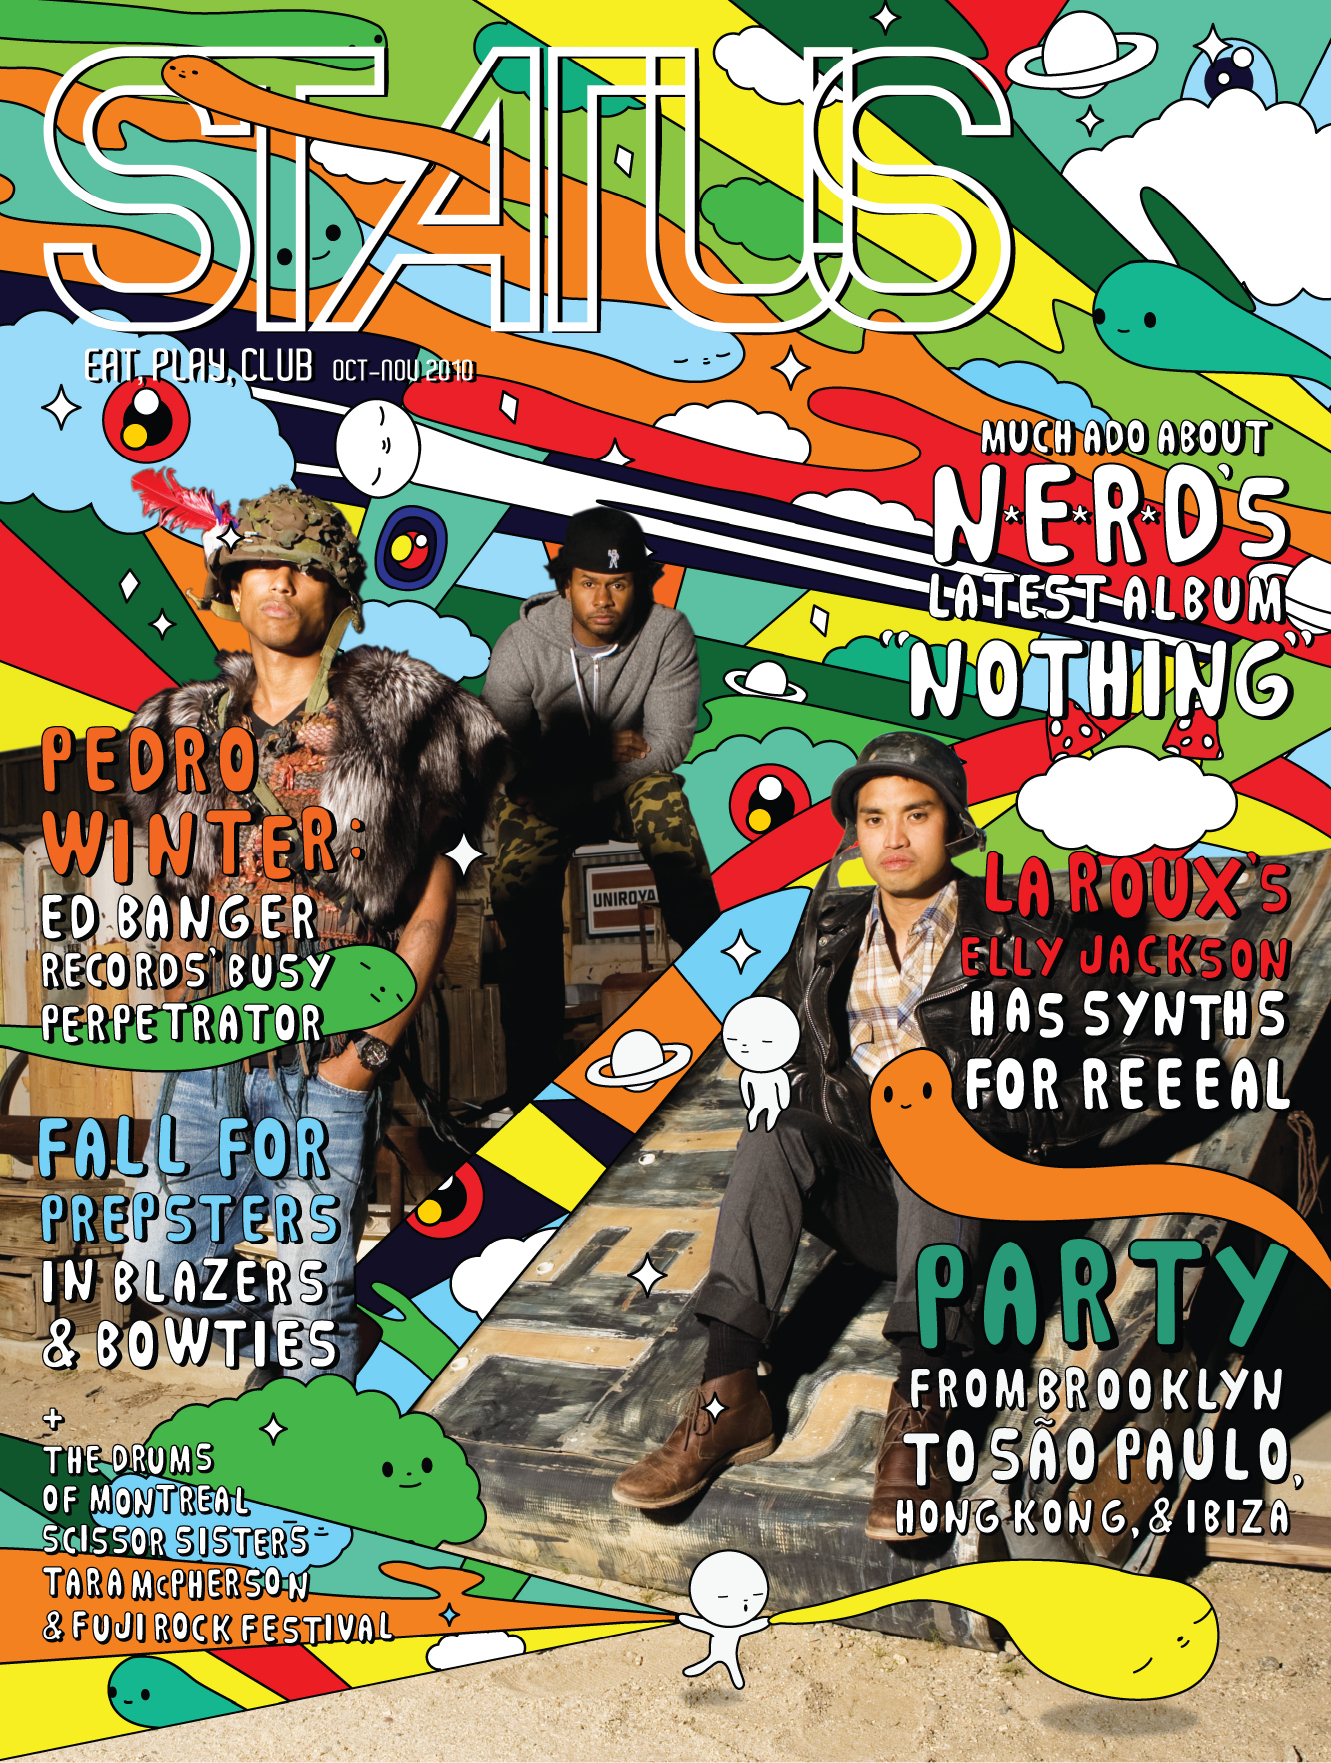 STATUS Magazine, October - November 2010